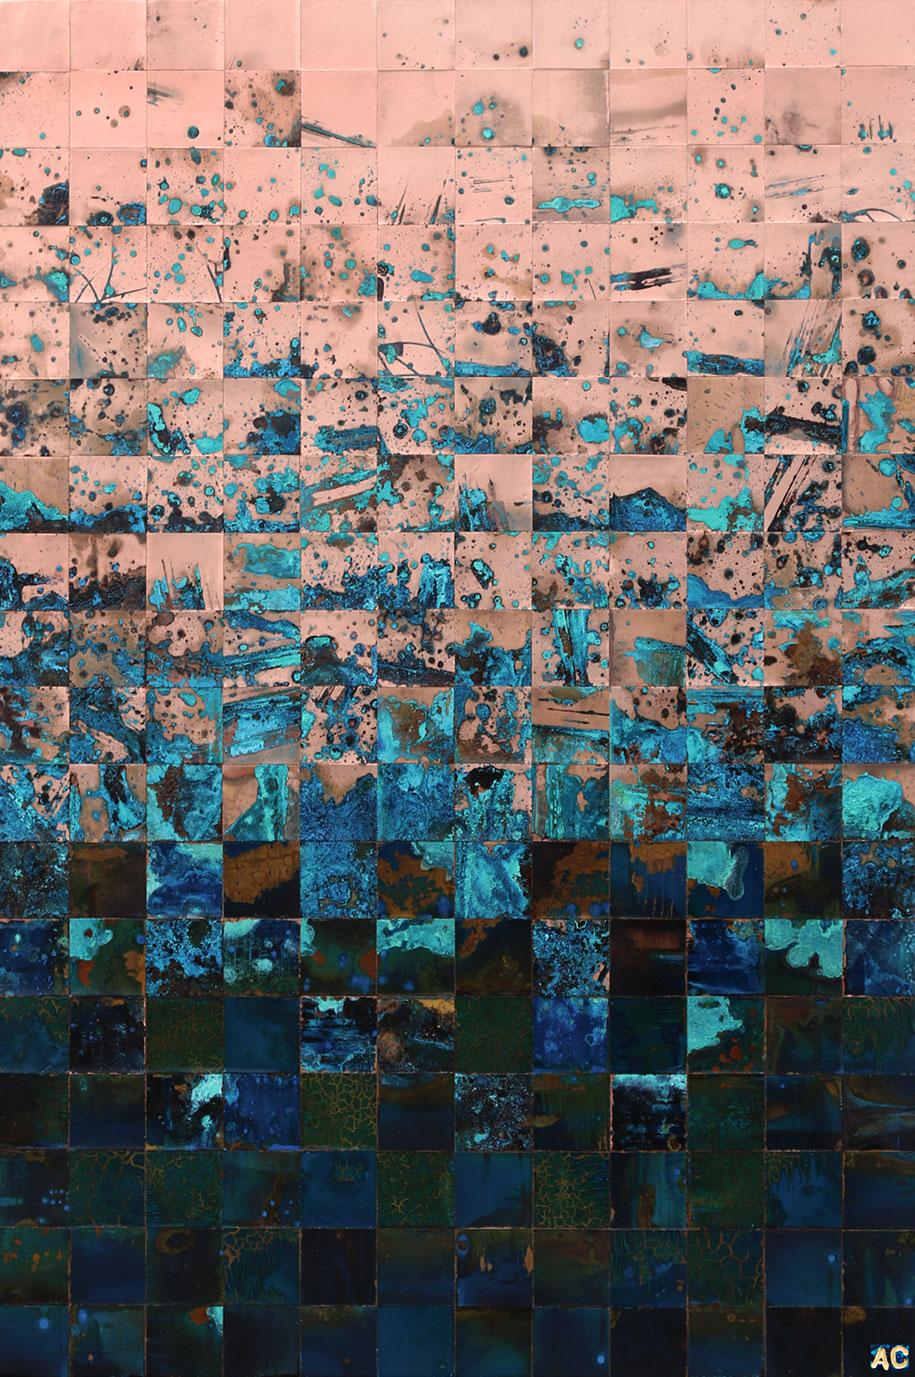 Adam Colangelo, Ambient No. 1, 2016, $2,150